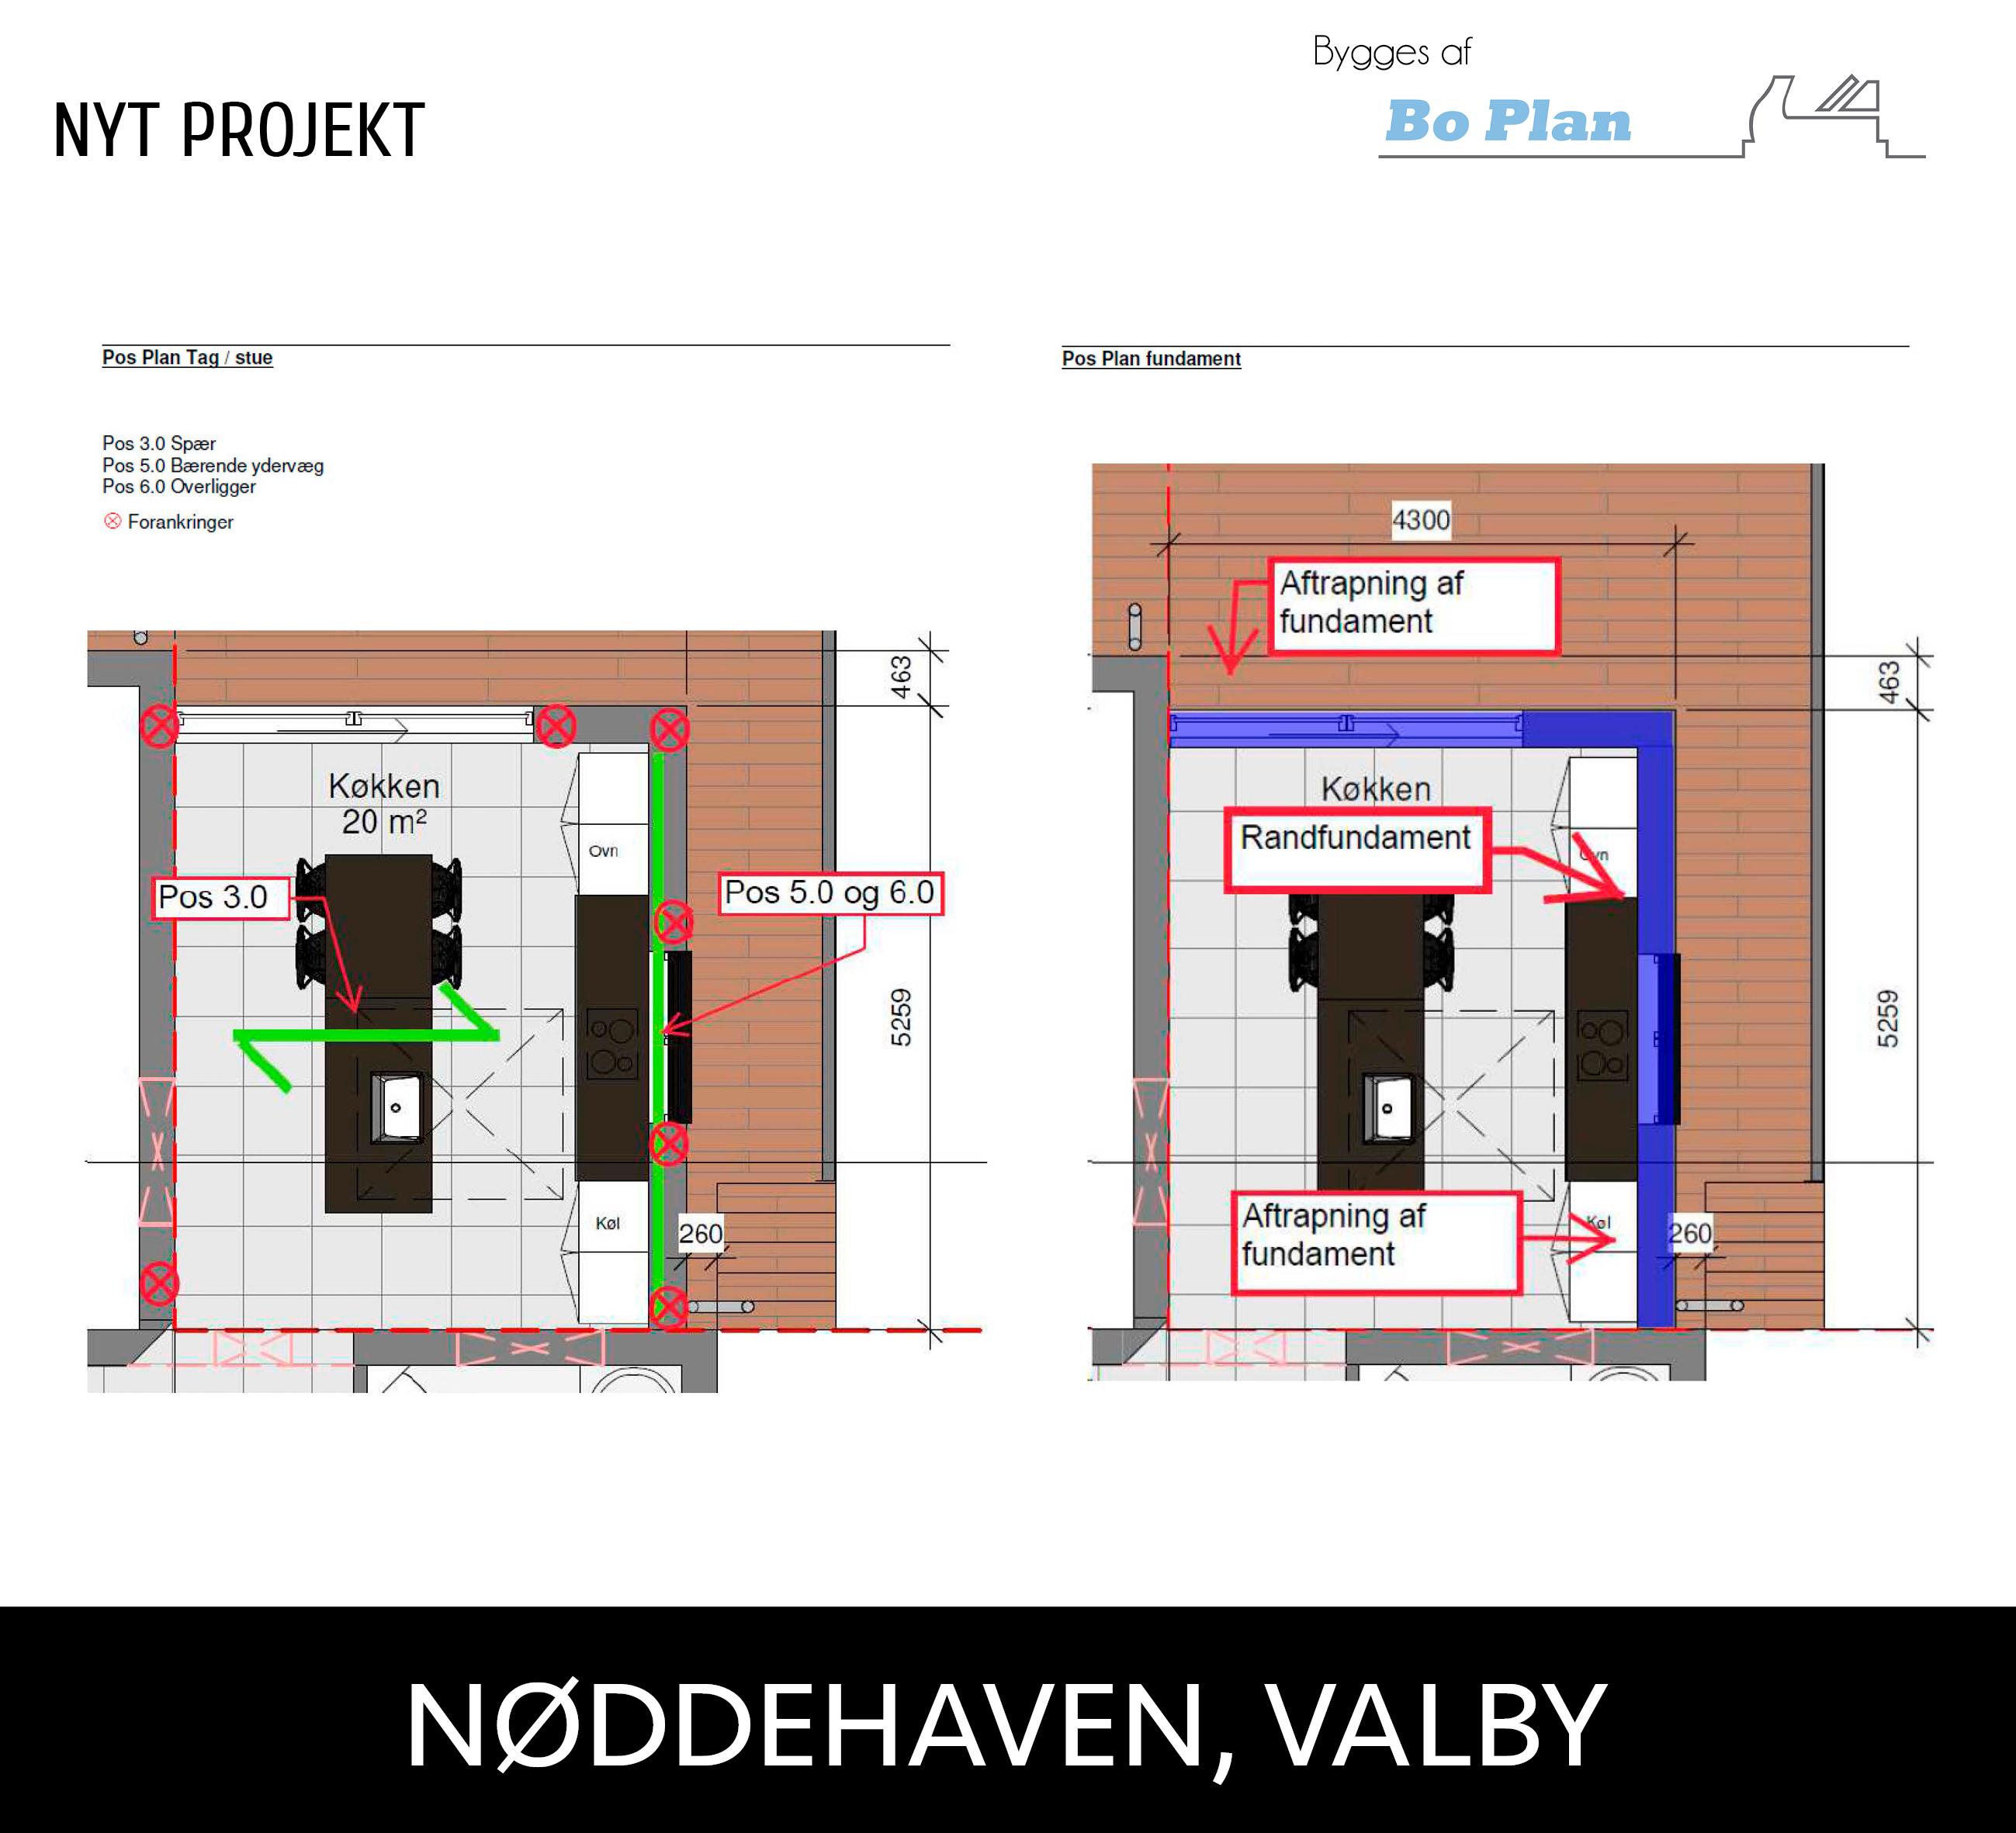 Nøddehaven, Valby3